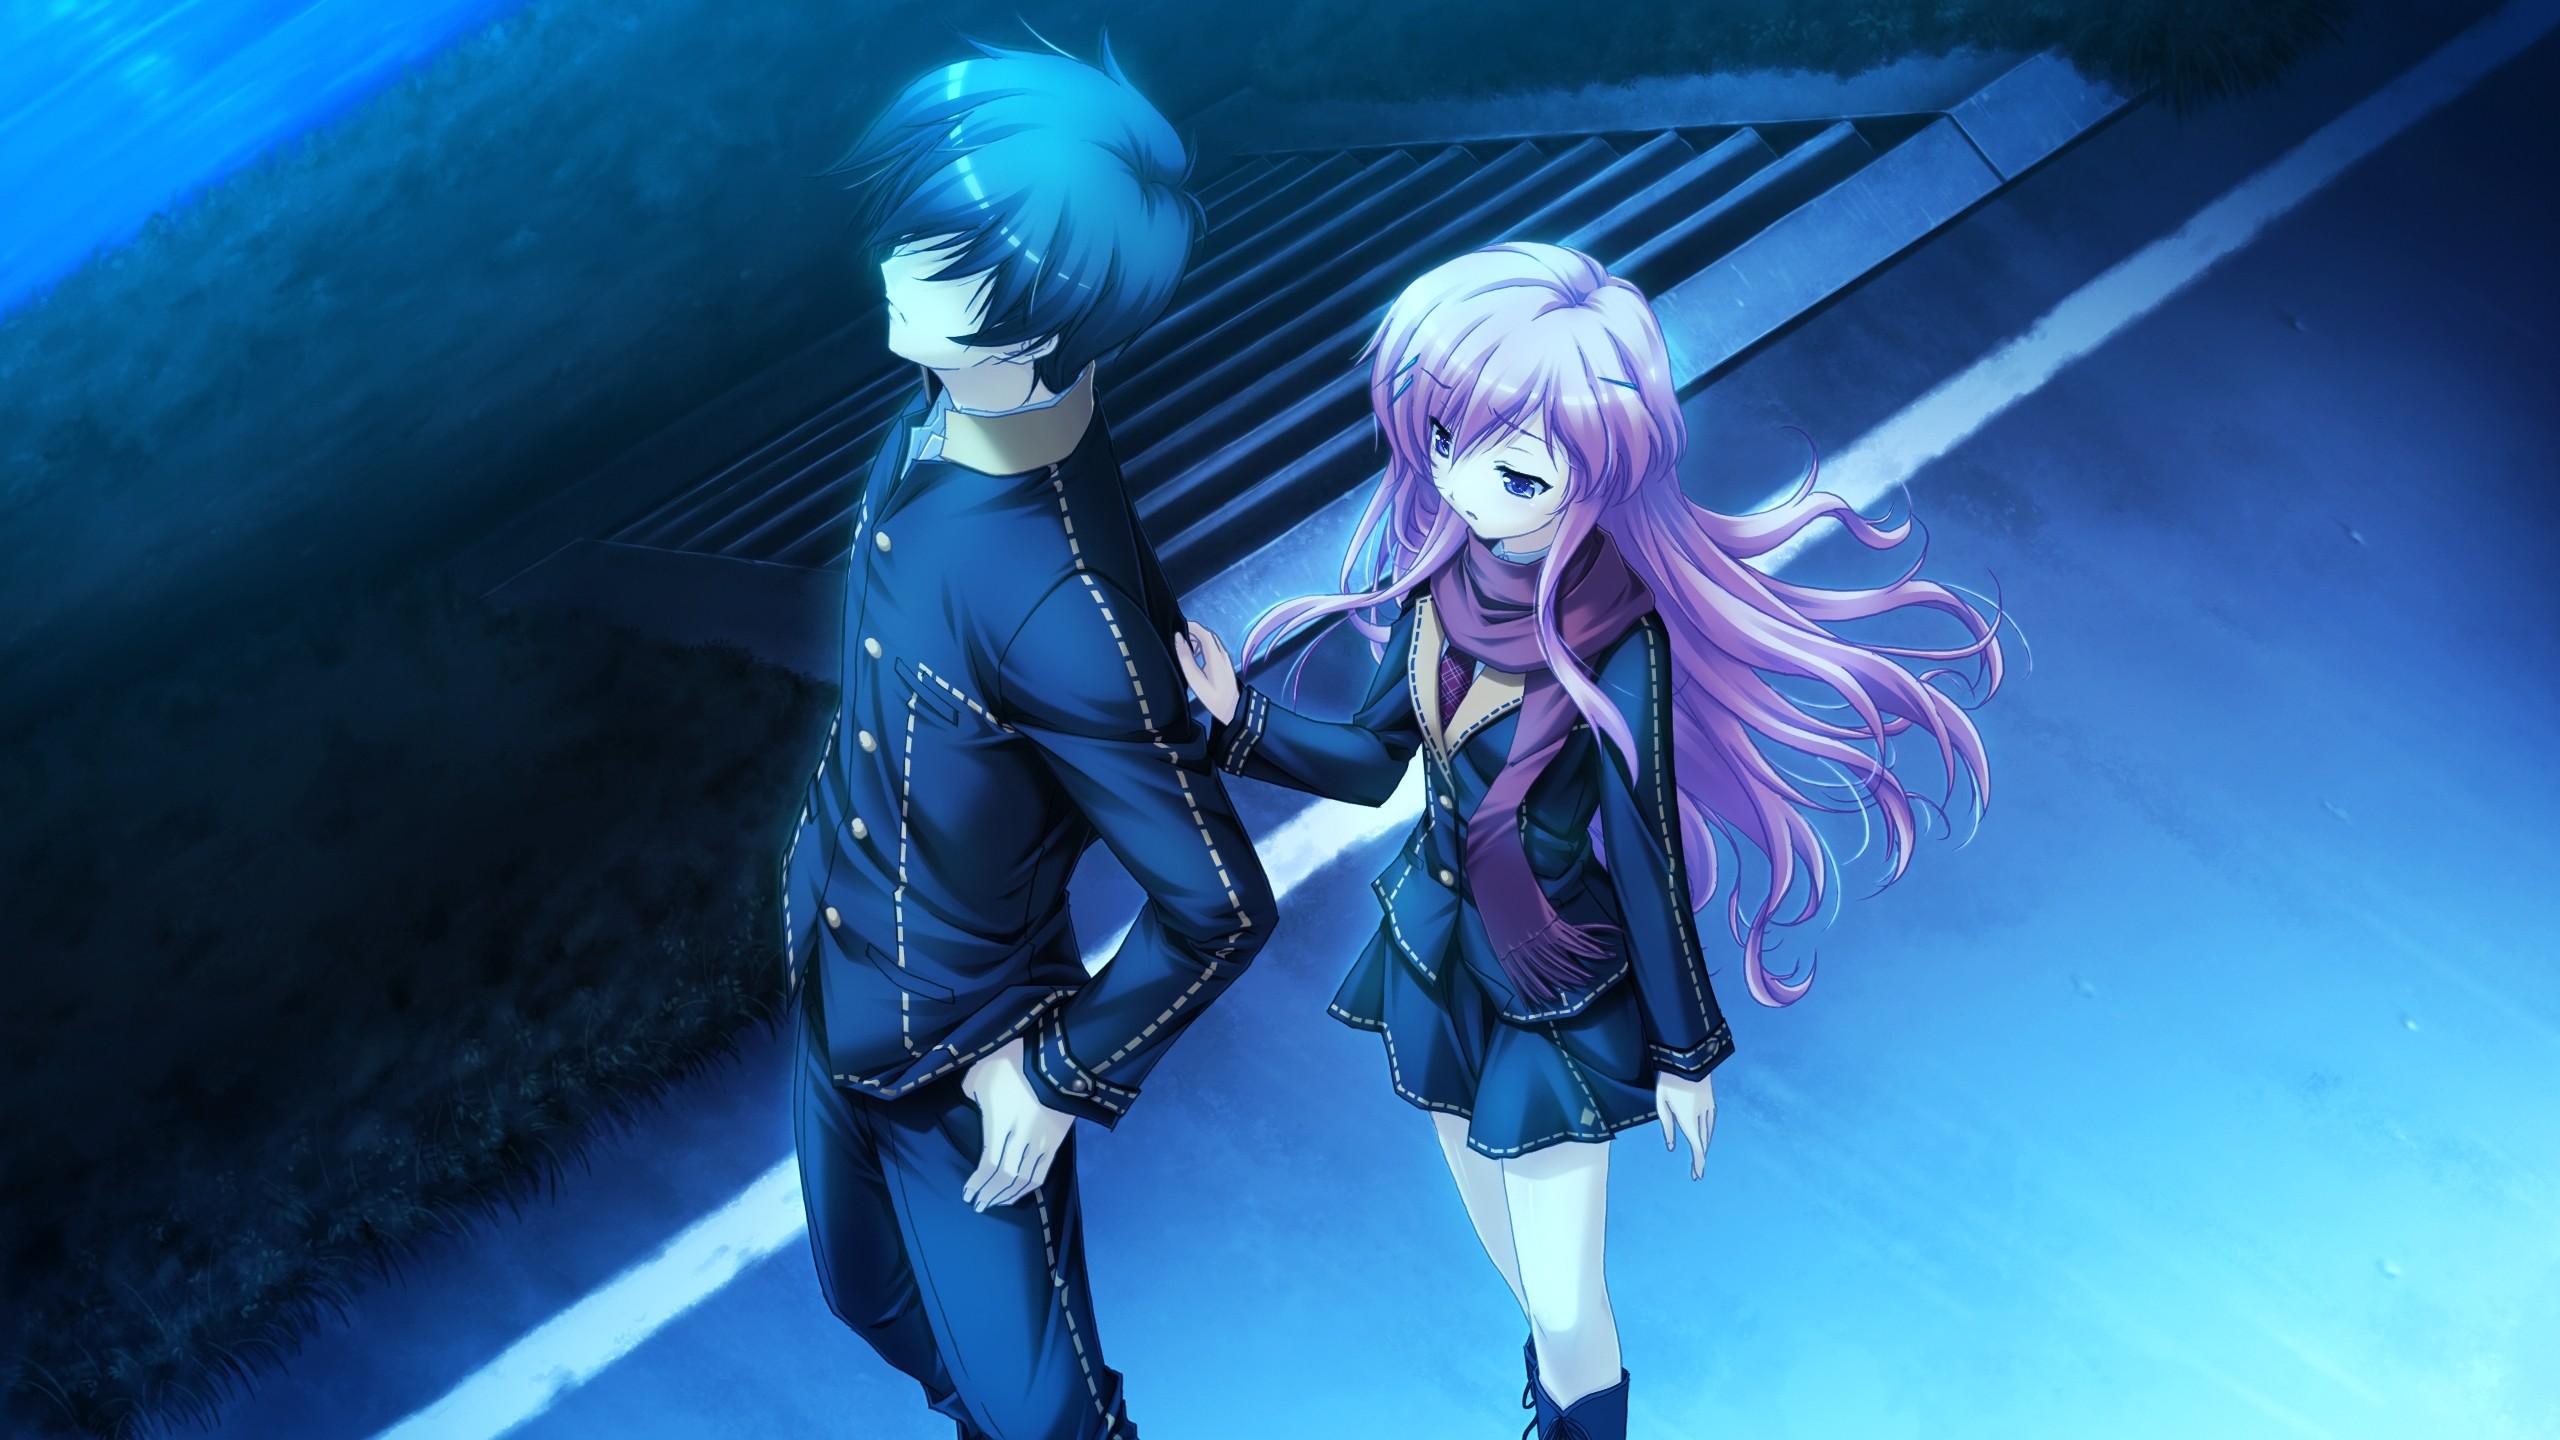 Wallpaper anime, boy, girl, touching, twilight